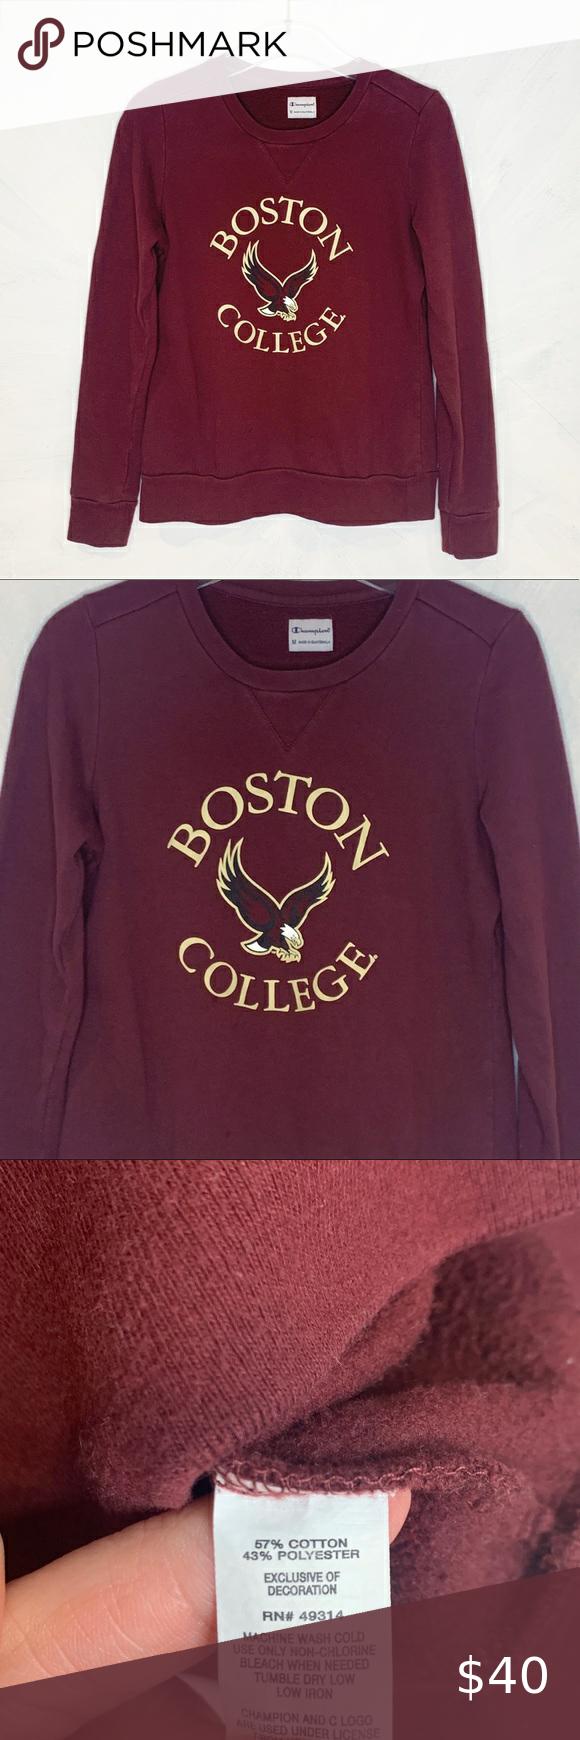 Champion Boston College Bc Crewneck Sweatshirt Crew Neck Sweatshirt Sweatshirts Sweatshirt Tops [ 1740 x 580 Pixel ]